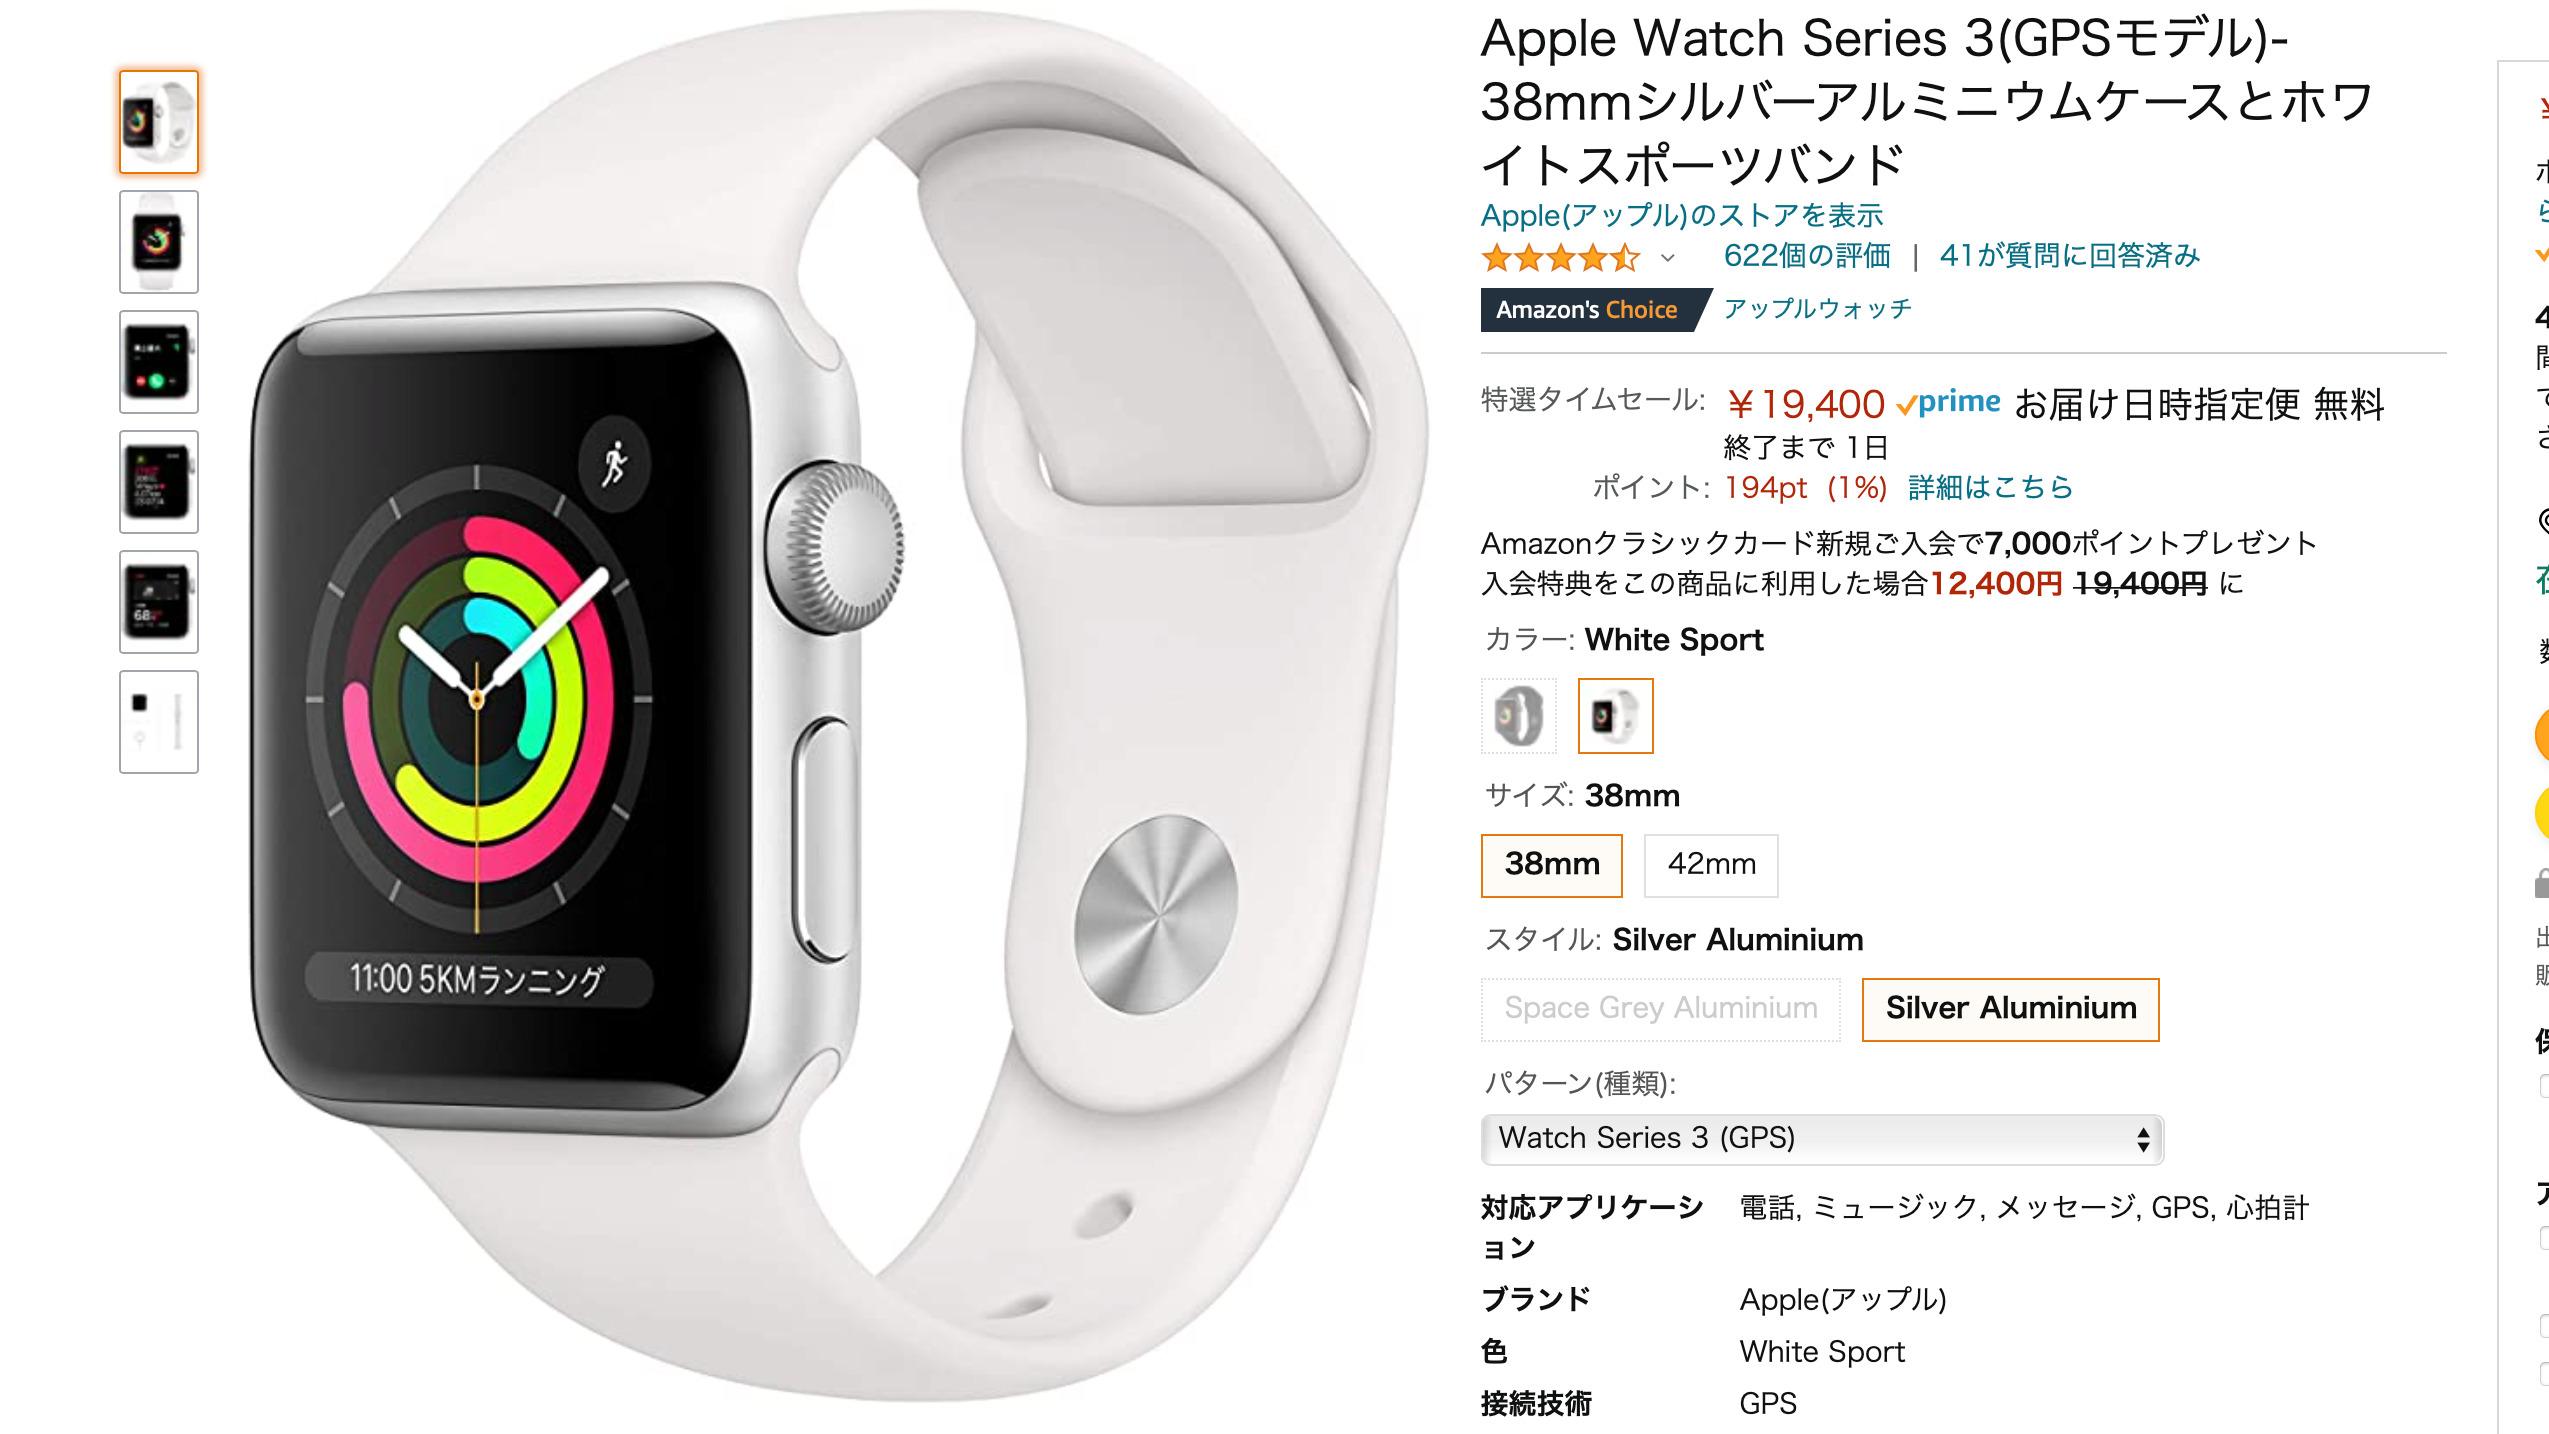 Apple Watch Series 3 Amazon